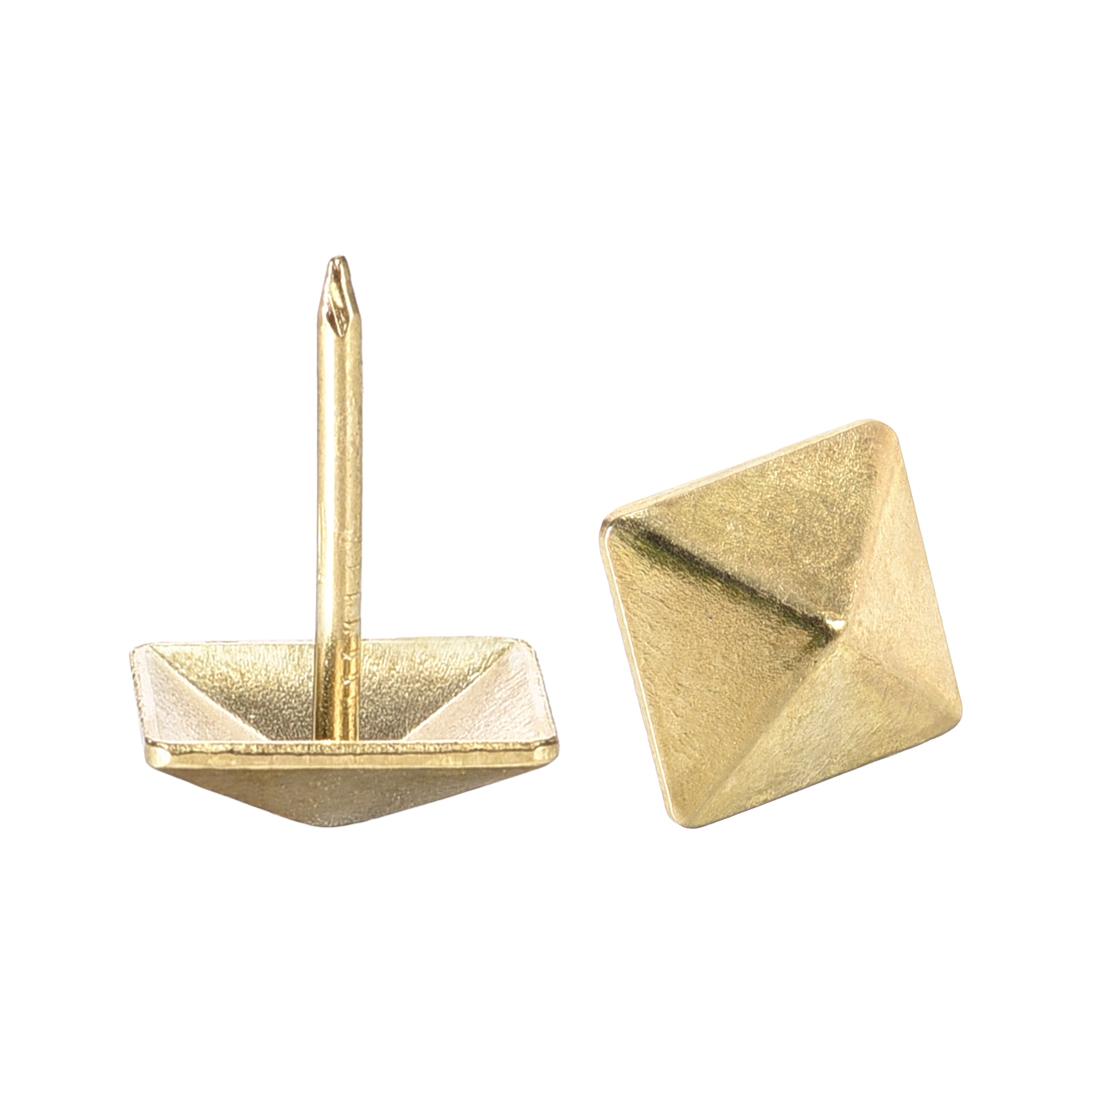 Upholstery Nails Tacks 12mm Square Head 17mm Height Nails Pins Gold Tone 50 Pcs